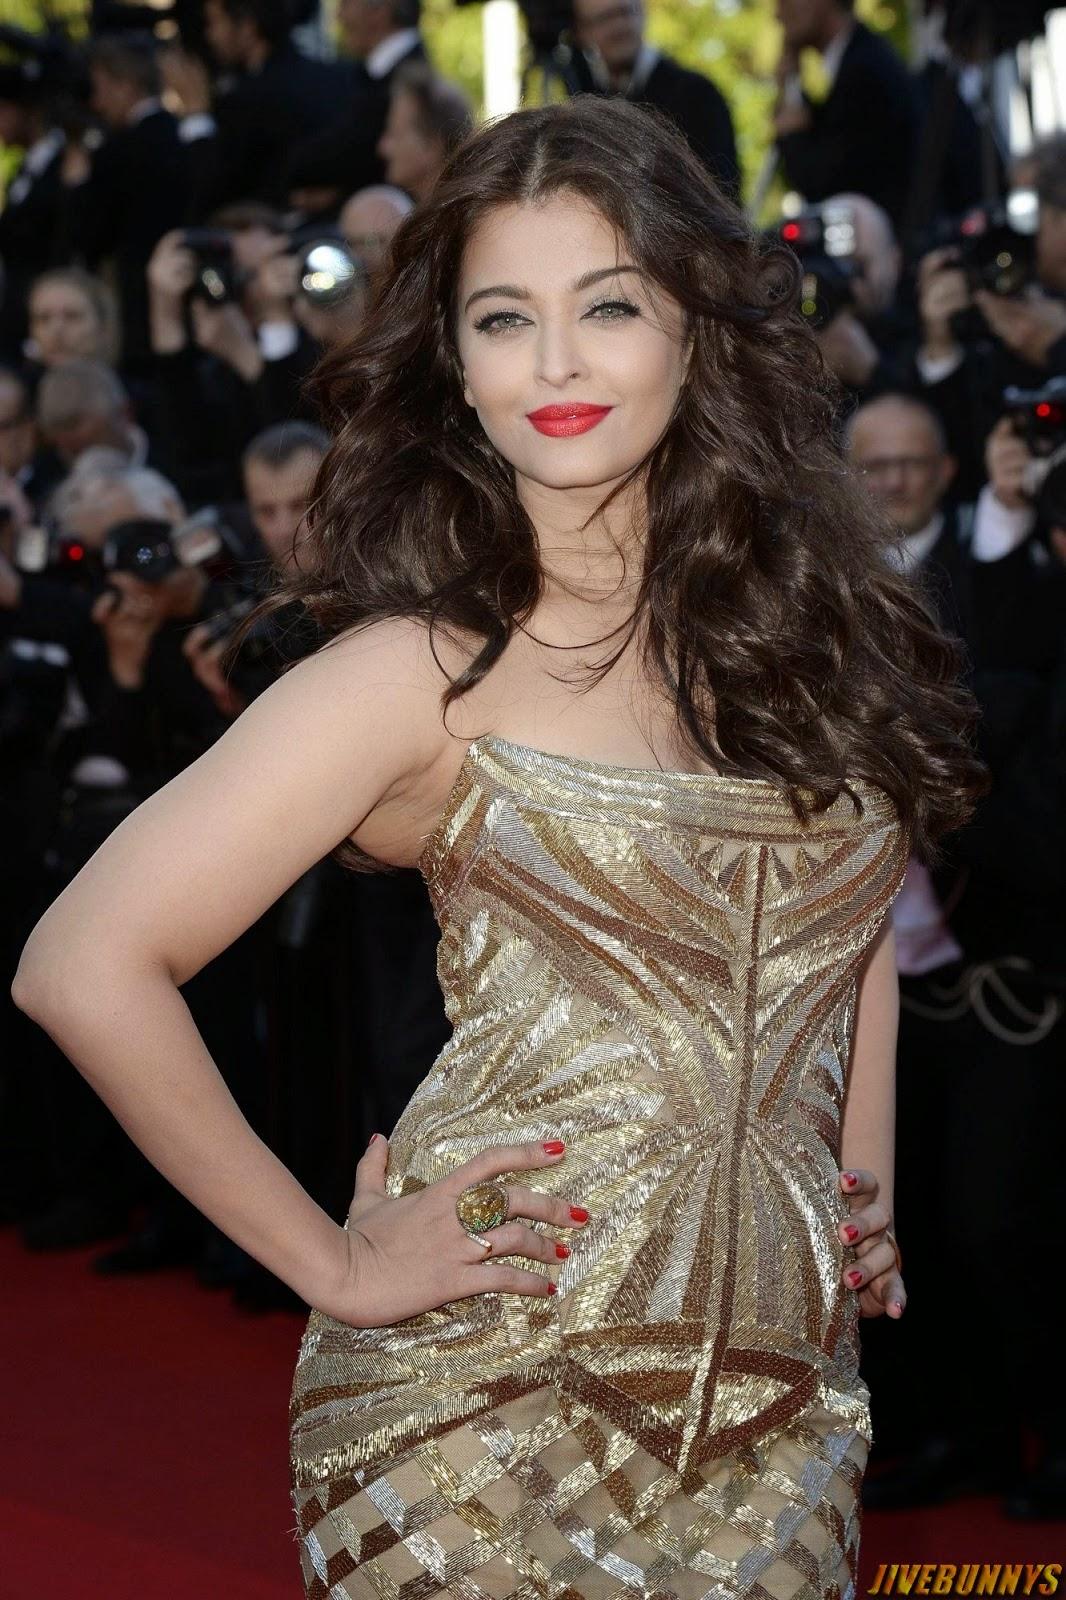 Aishwarya Rai Latest New Look Hd Hot And Sexy Photo Gallery-7684